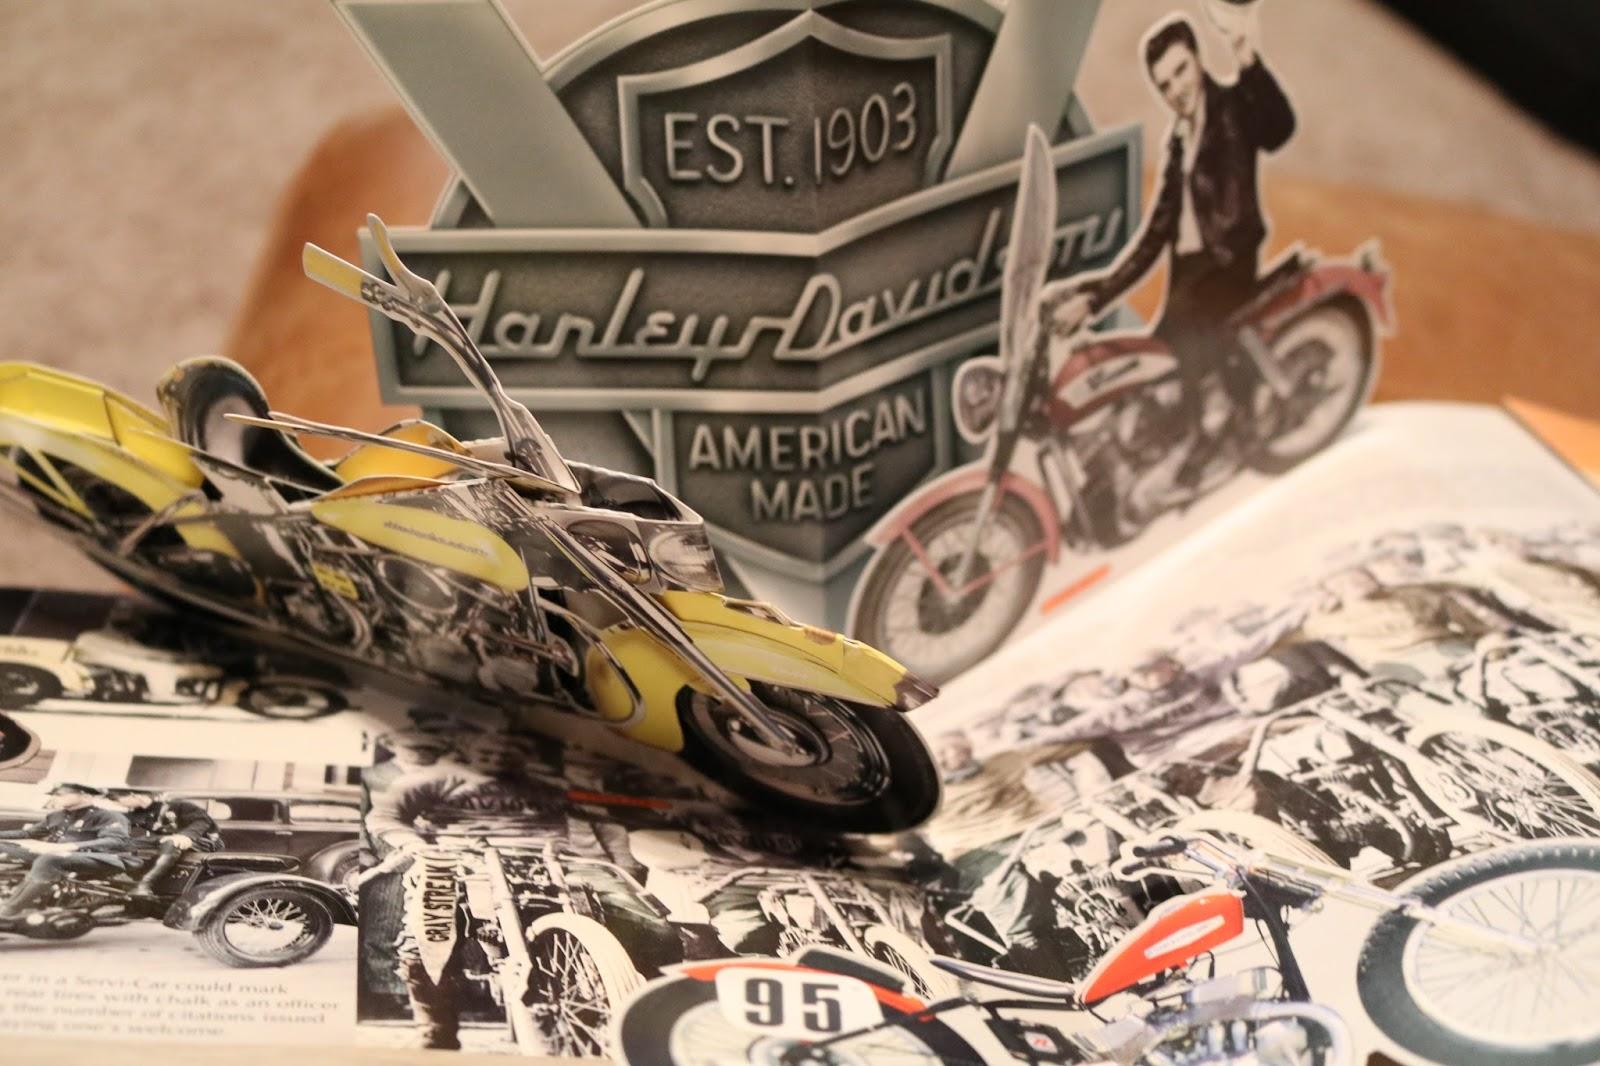 1970 Harley Davidson Evel Knievel Tribute: OldMotoDude: Harley-Davidson Pop-Up Book